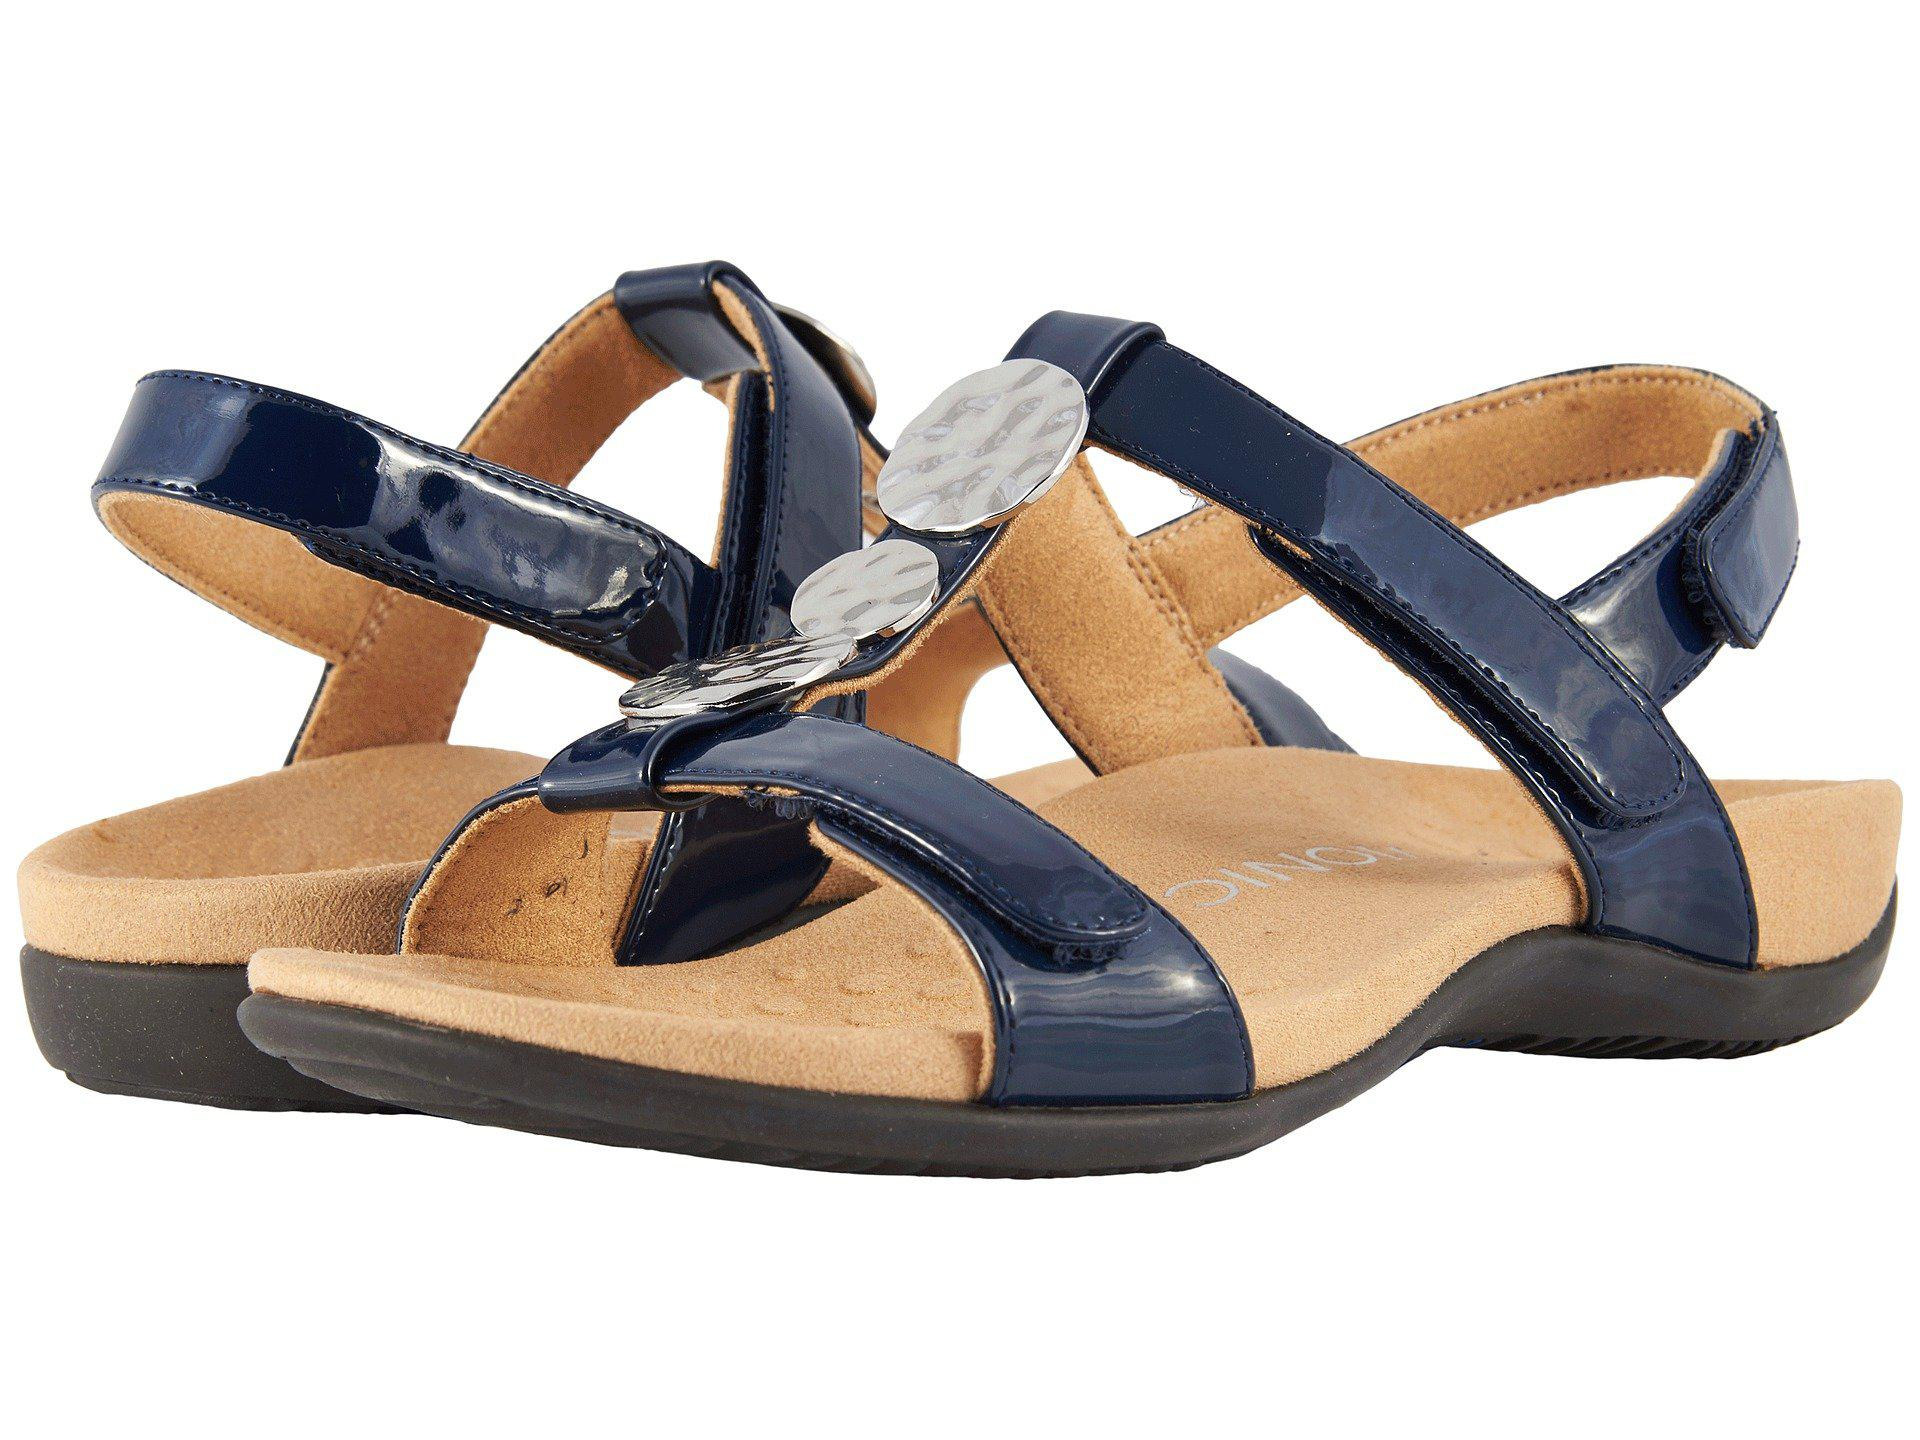 99b64acfb040 Lyst - Vionic Farra T-strap Sandal in Blue - Save 50.561797752808985%